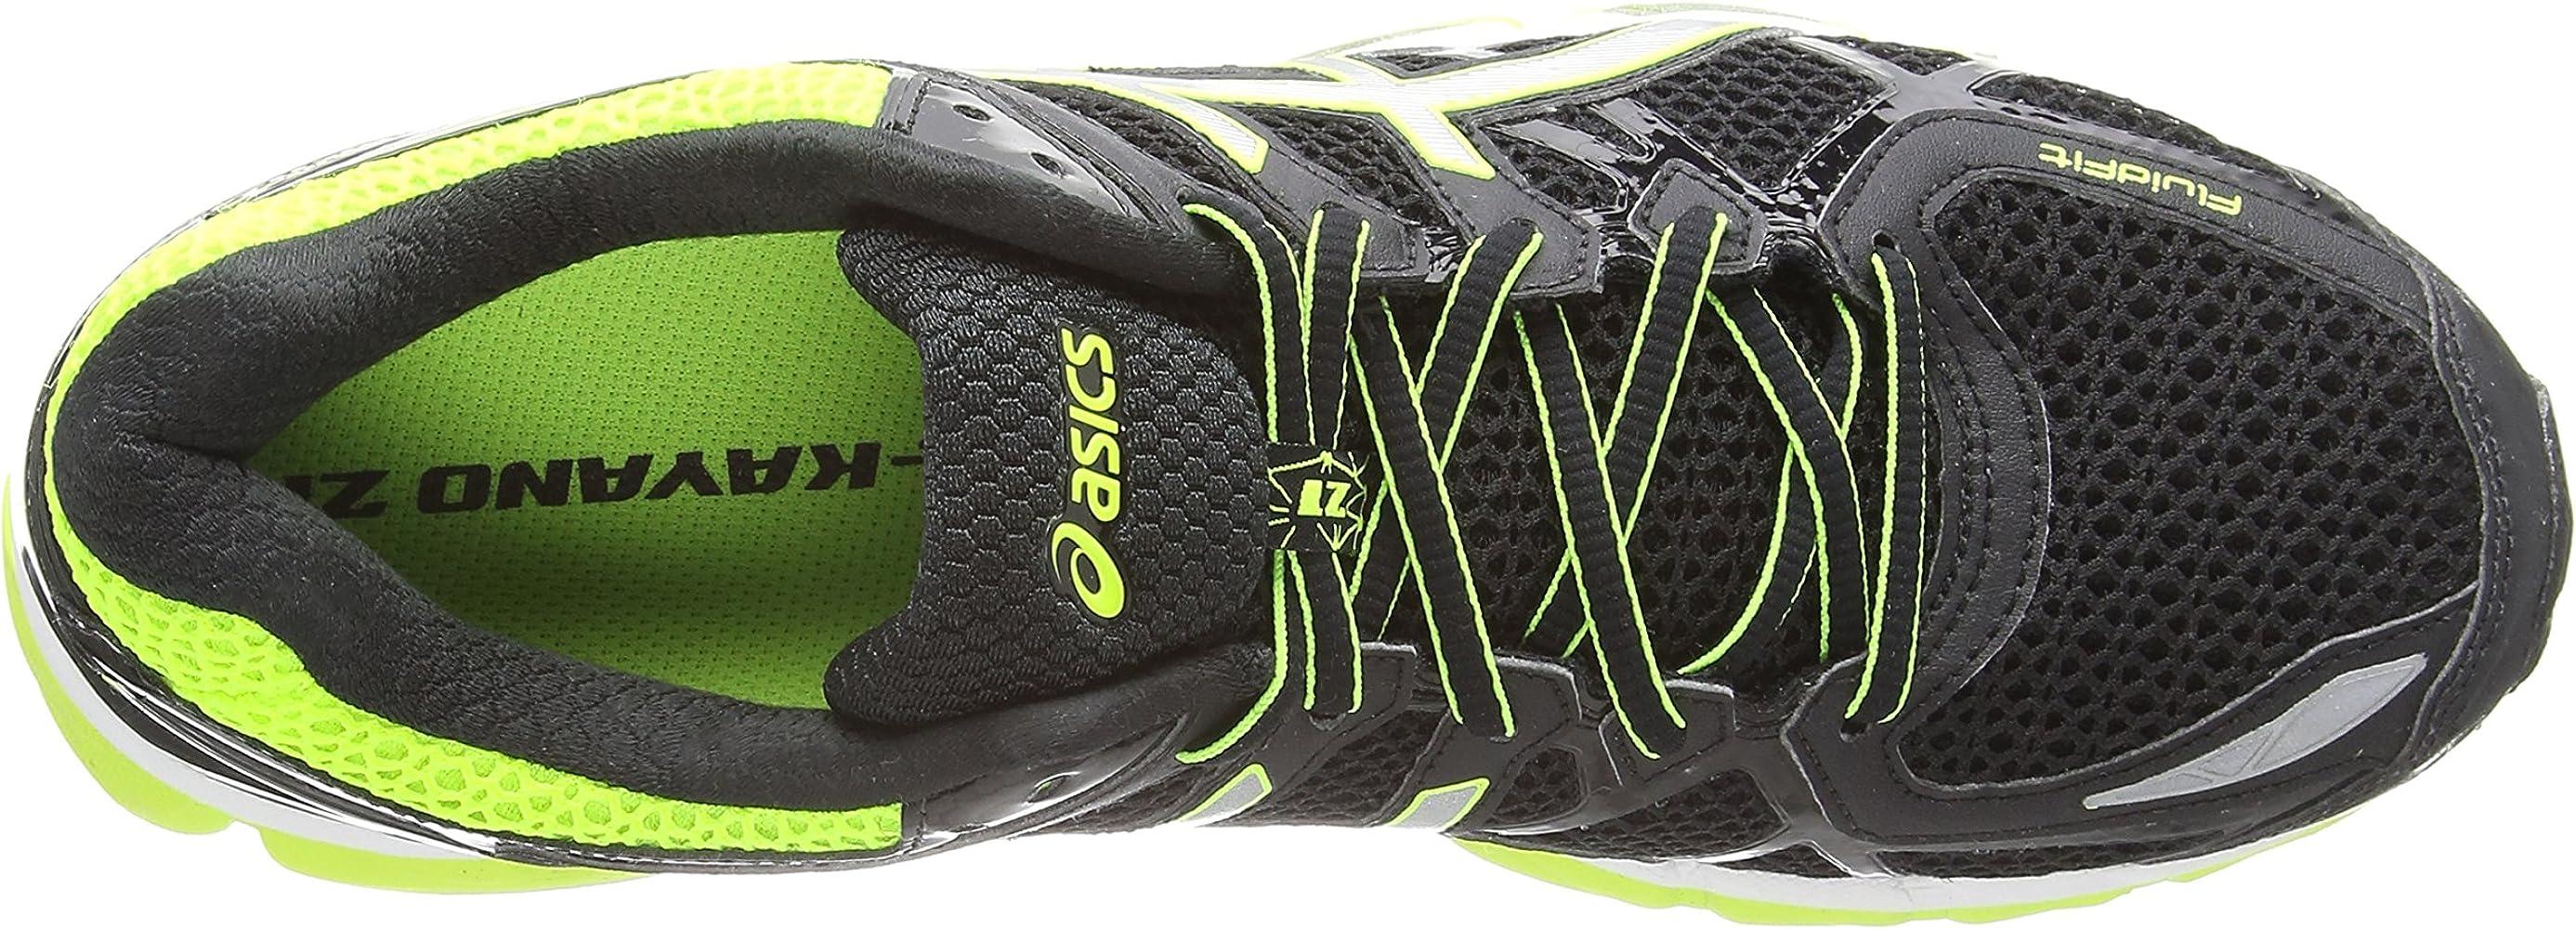 Asics Gel-Kayano 21, Zapatillas de Running Unisex, Negro Black ...